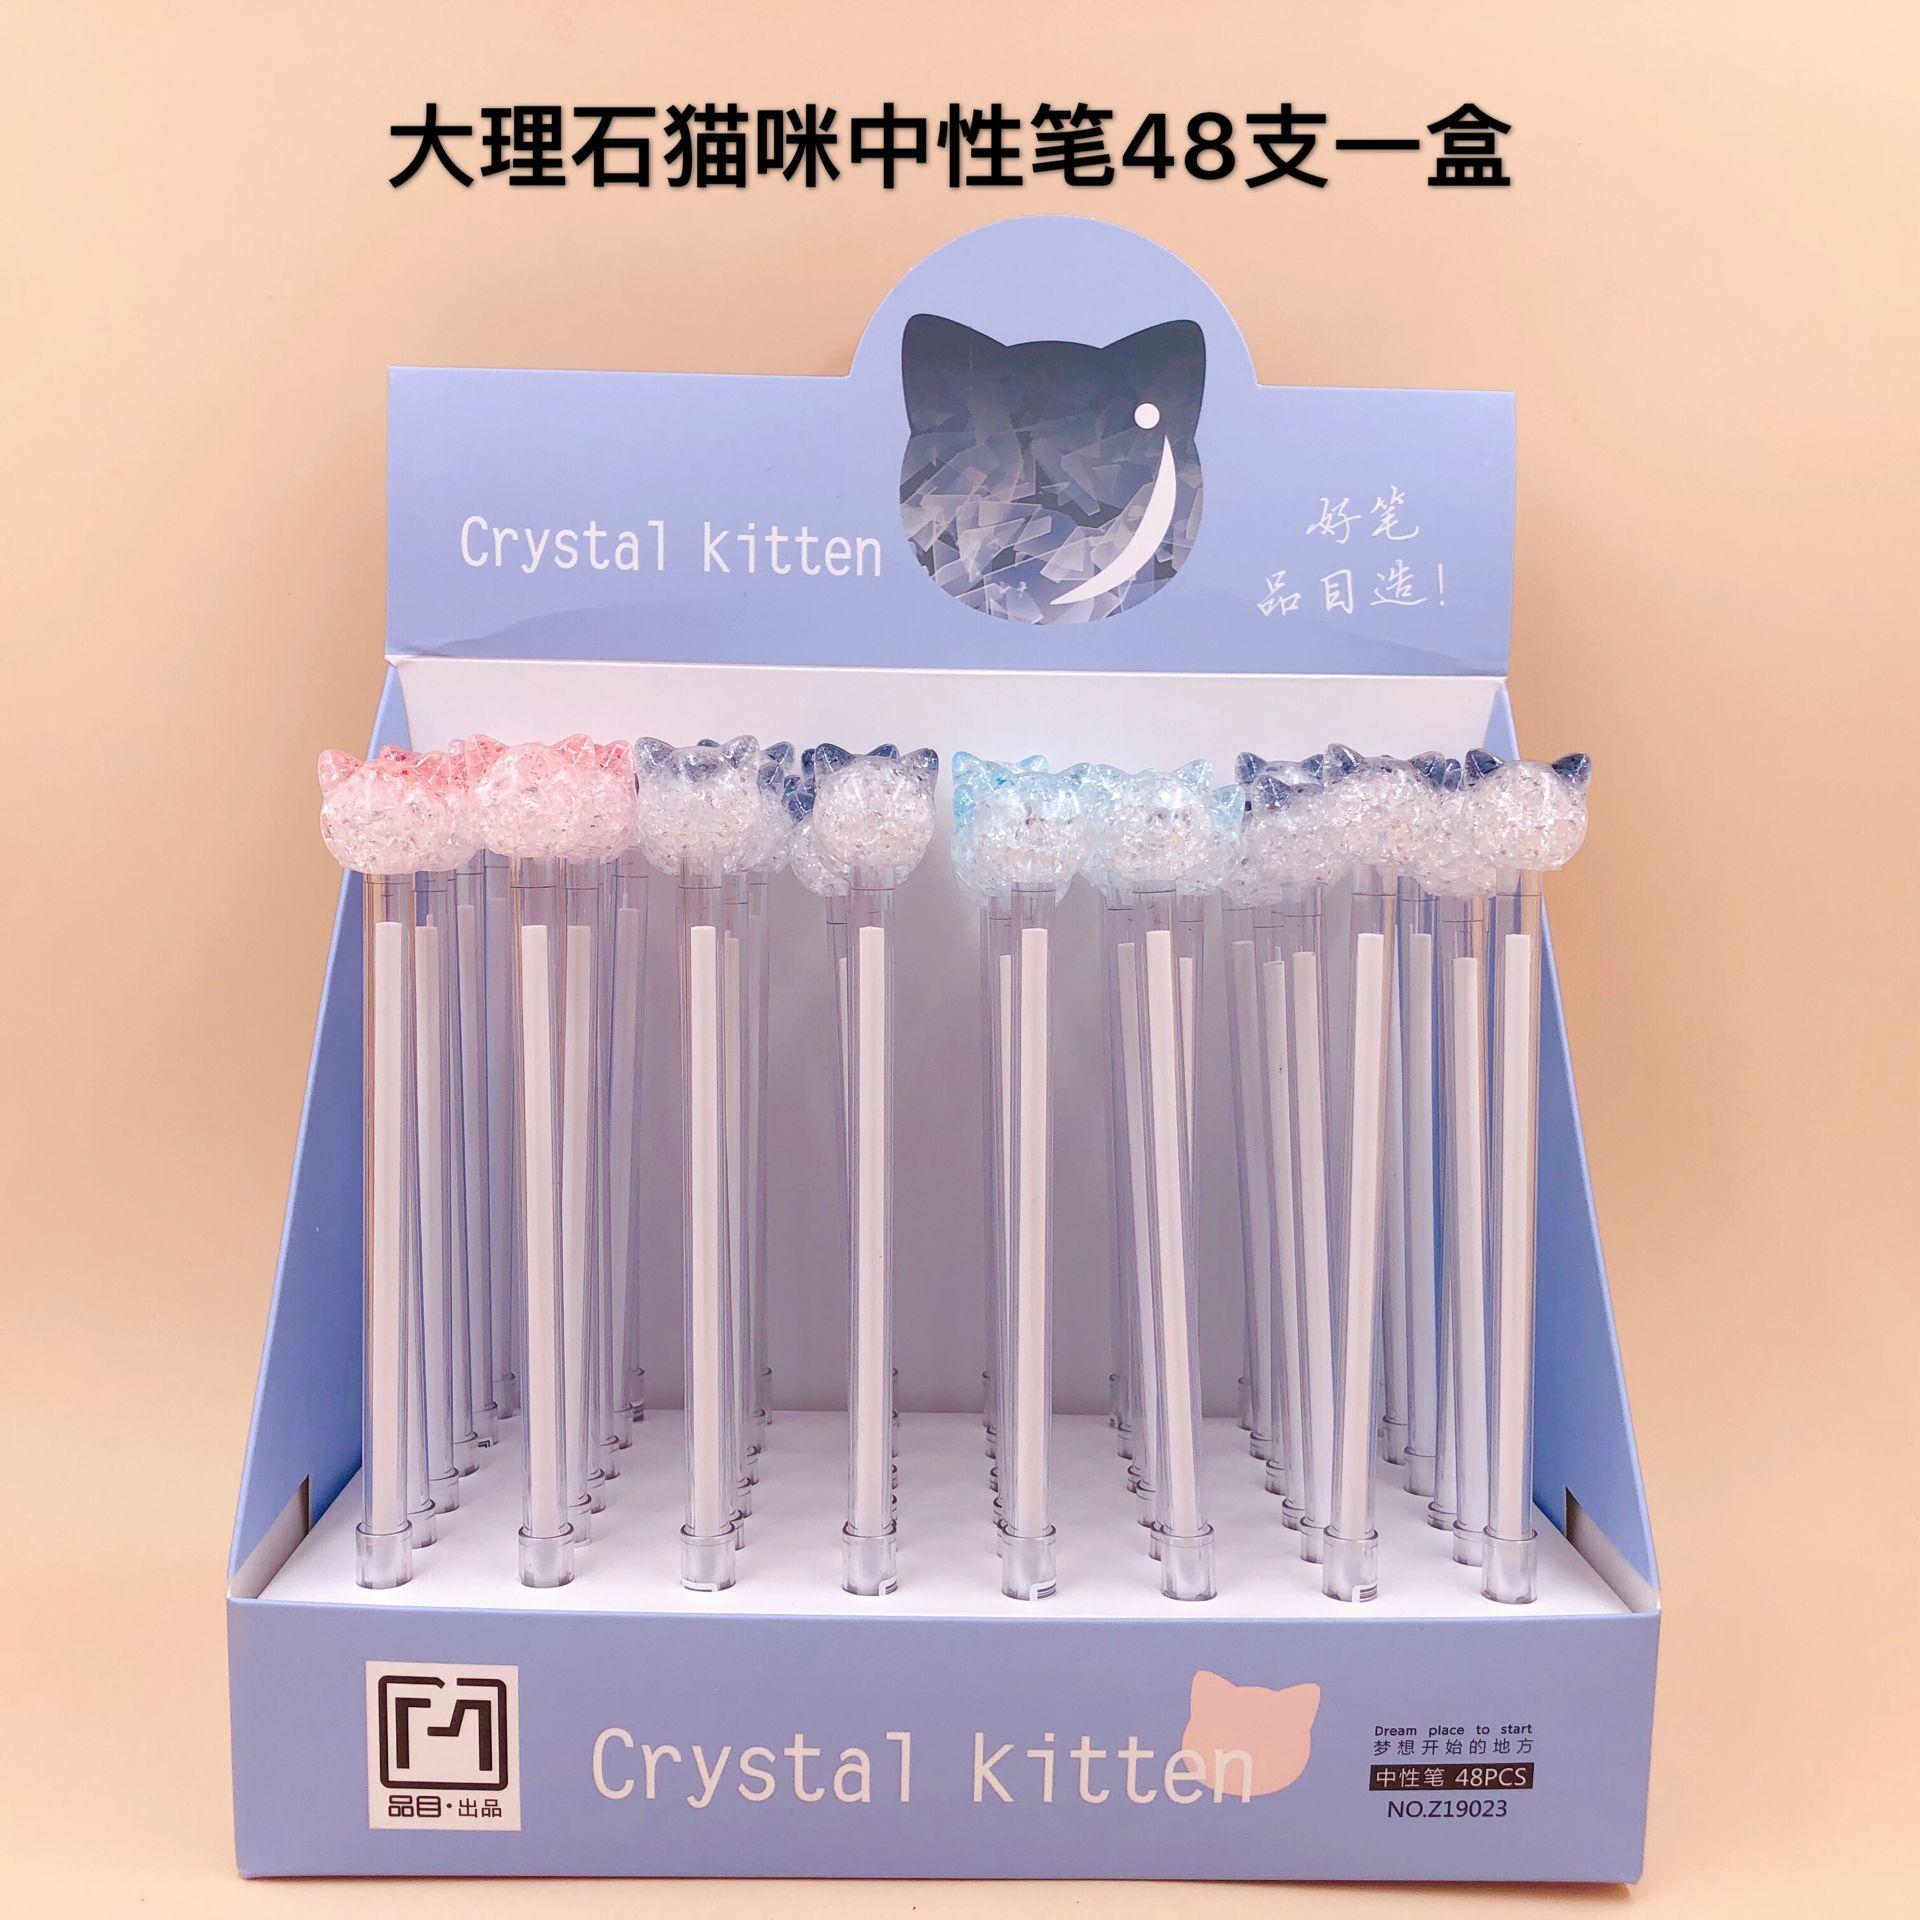 48 Pcs Kawaii Gel Pens Marble Crystal Cat Black Gel Ink Pens Pens for Writing Cute Stationery Office School Supplies 0.5mm